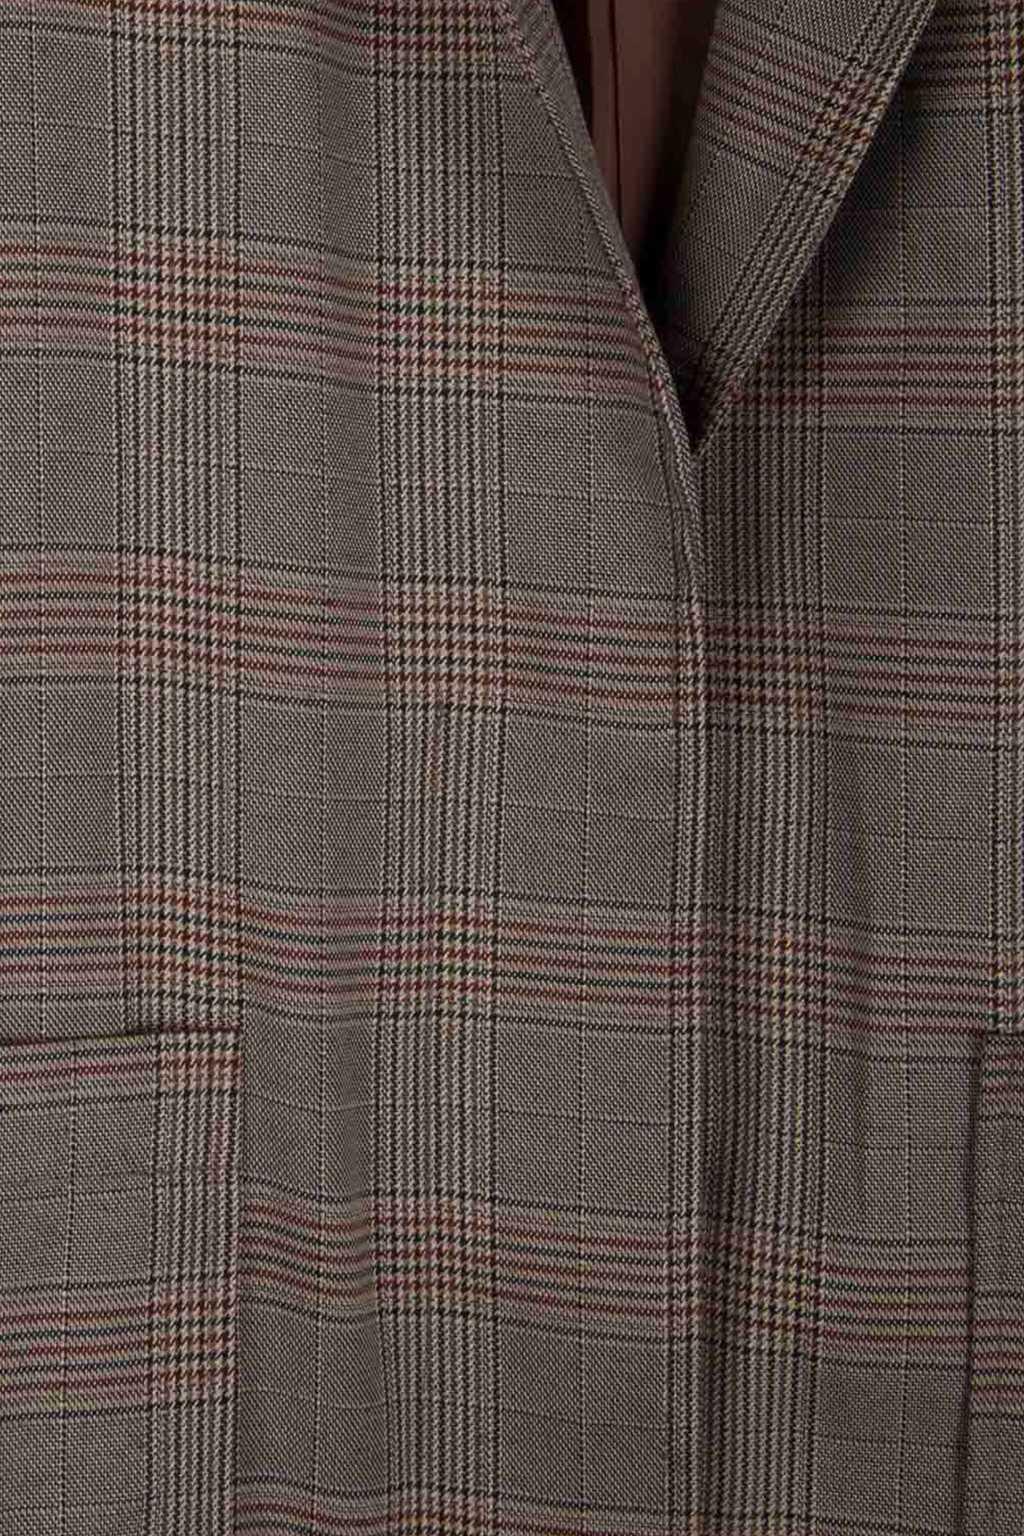 Coat H036 Beige 9